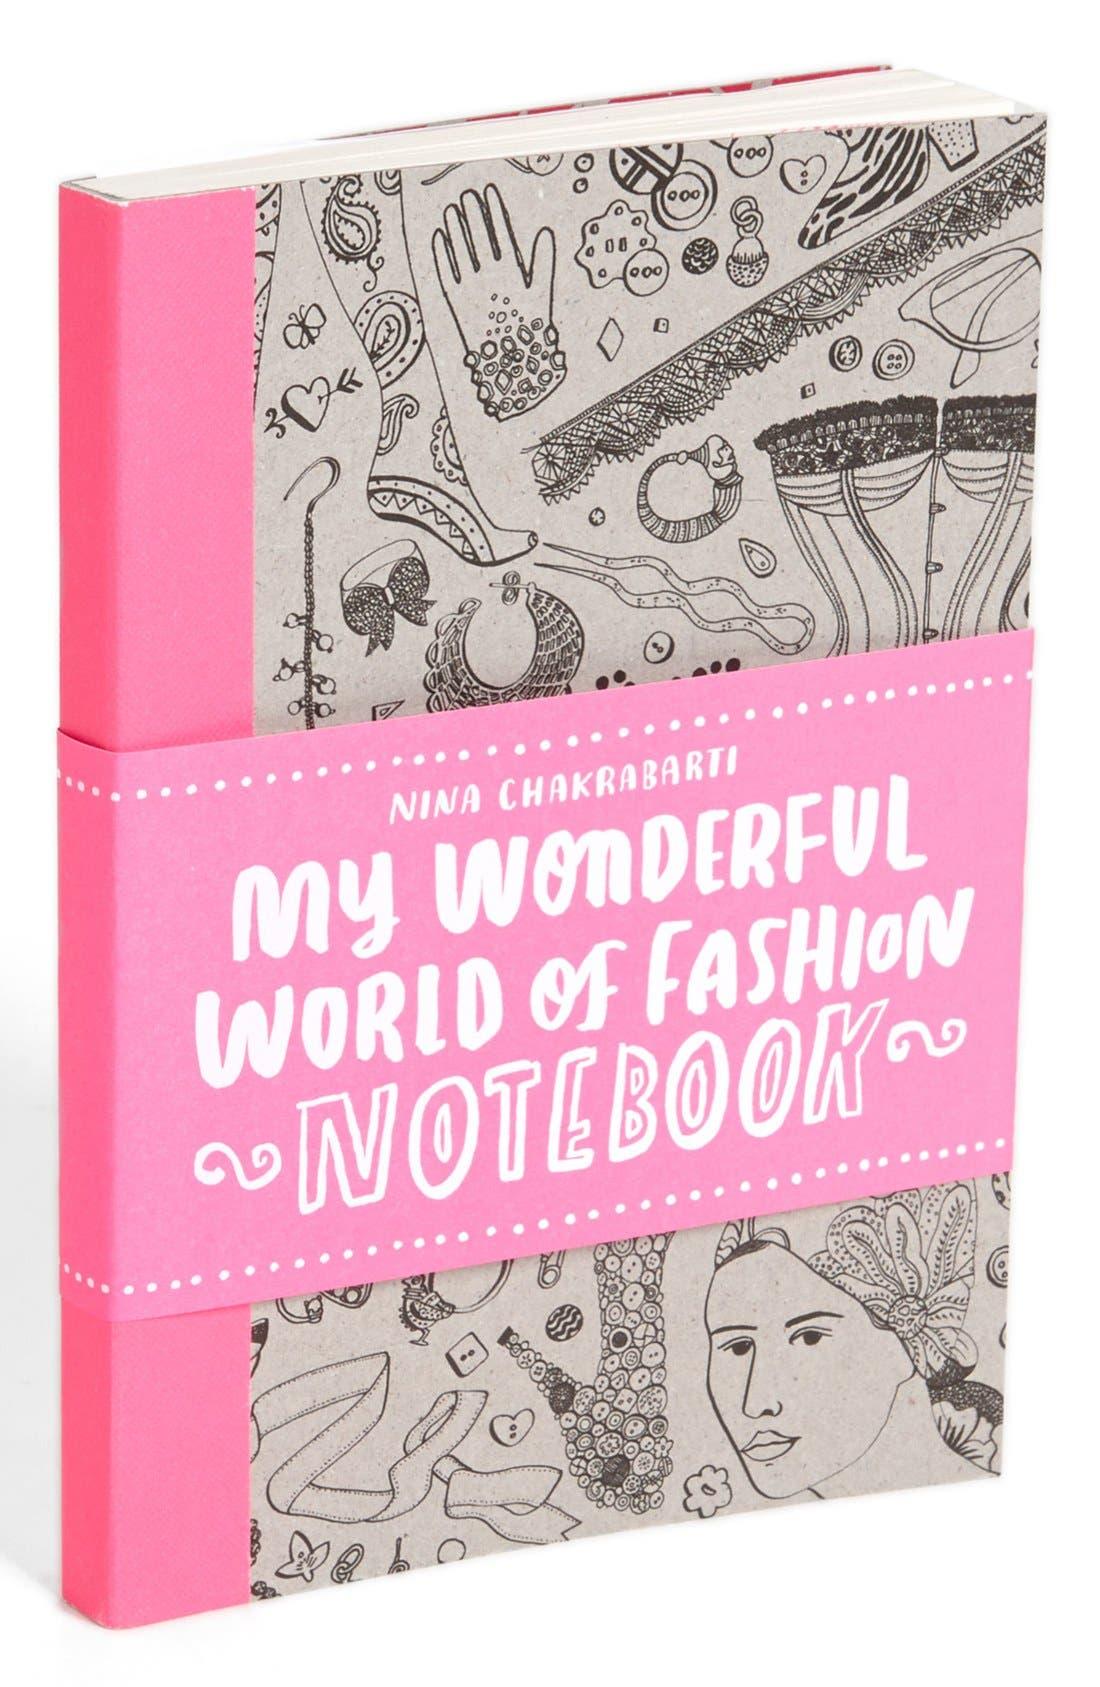 Alternate Image 1 Selected - Nina Chakrabarti 'My Wonderful World of Fashion' Notebook (Girls)